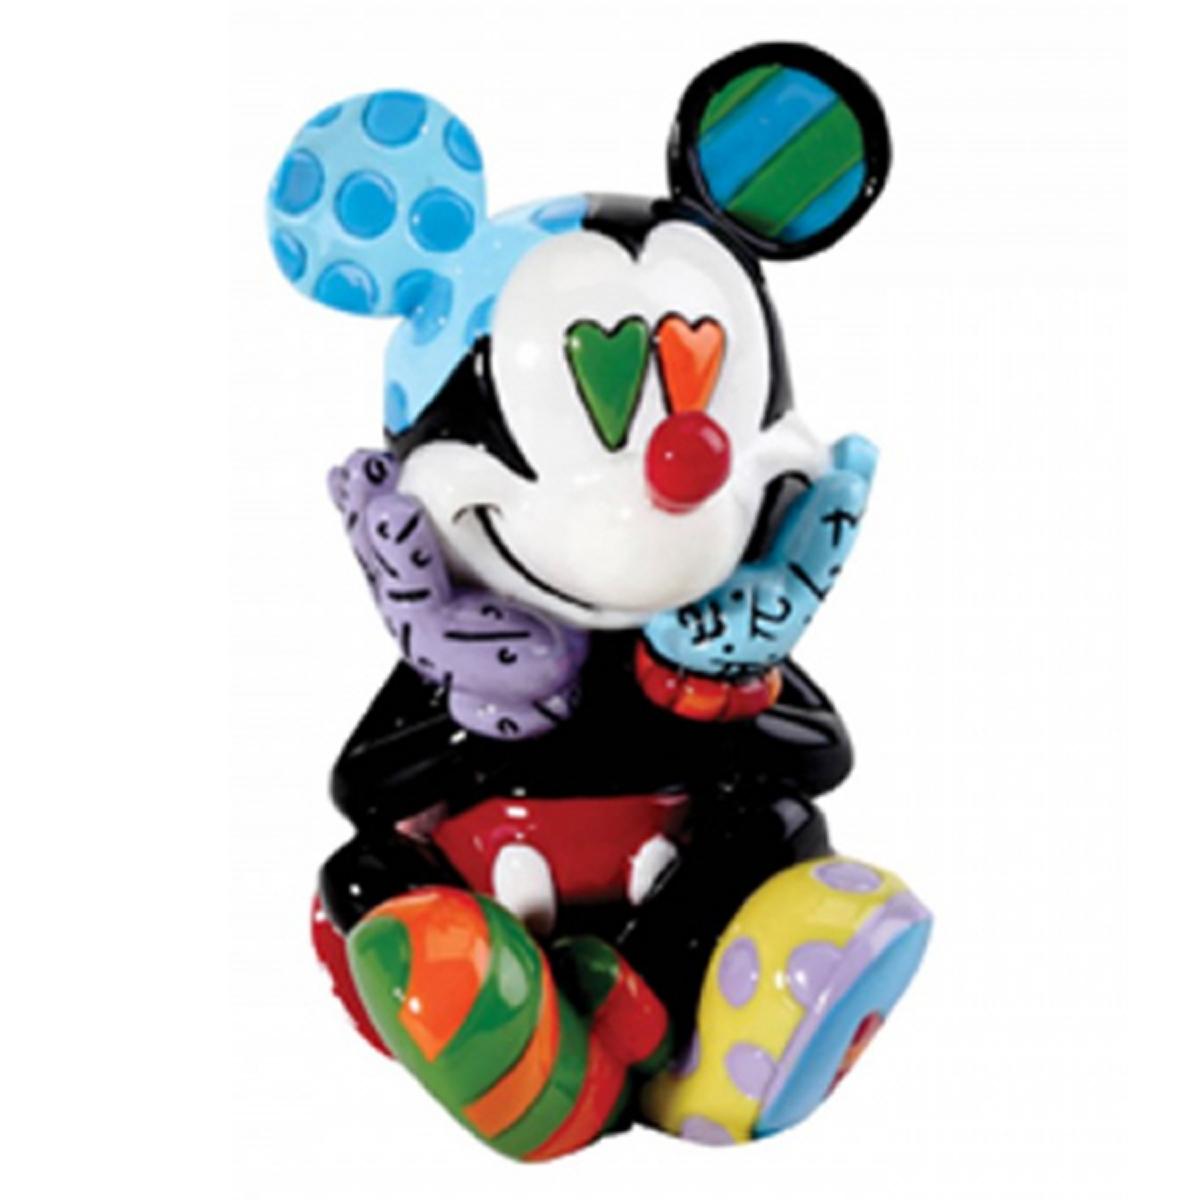 Figurine créateur \'Mickey\' multicolore amoureux (Britto) - 90x40 mm - [R2019]